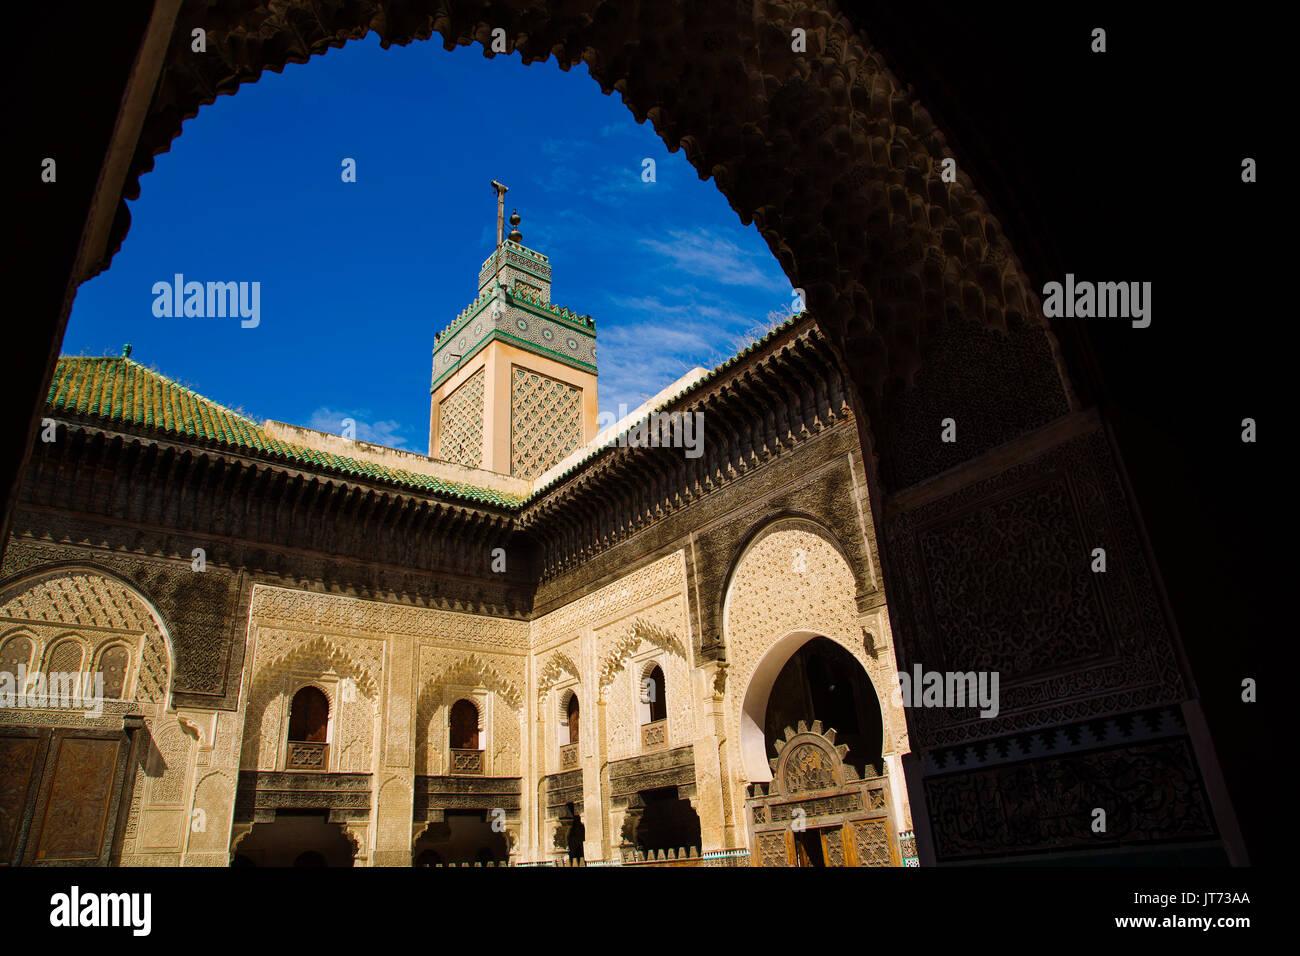 The Madrasa Bou Inania or Medersa Bu Inaniya.Souk Medina of Fez, Fes el Bali. Morocco, Maghreb North Africa Stock Photo